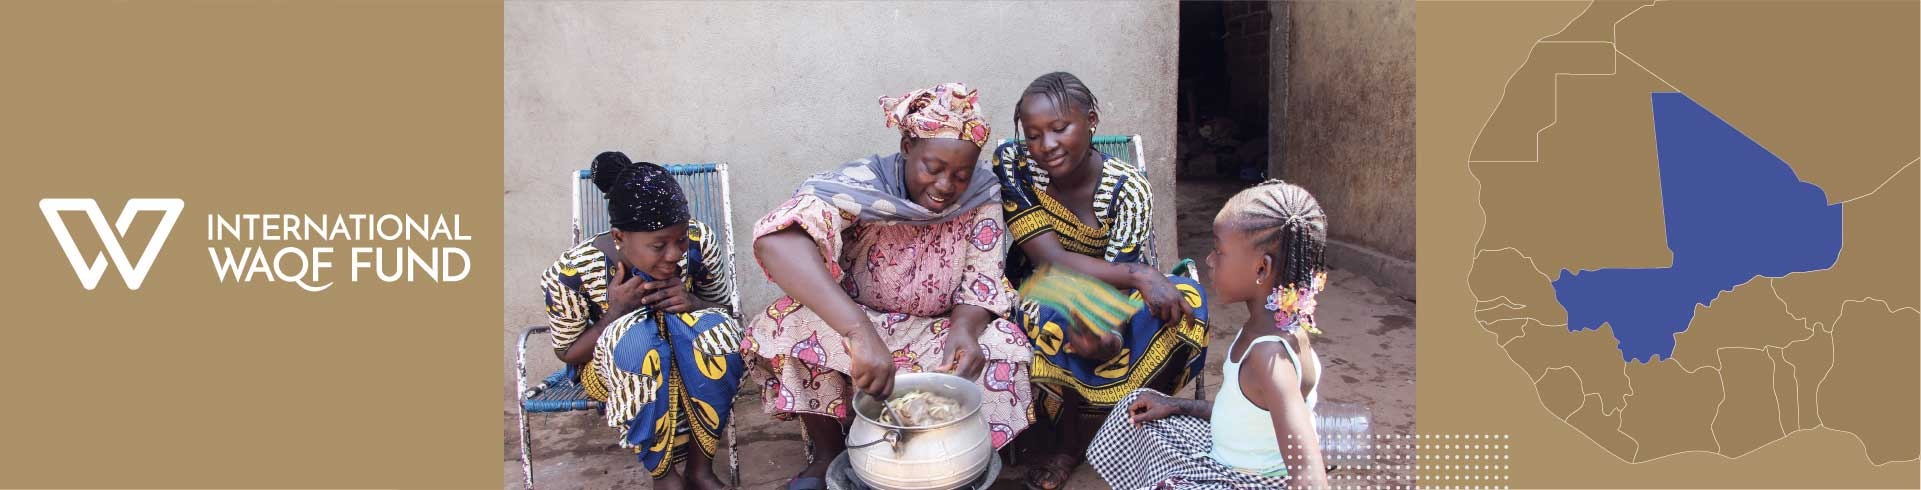 Helping families in Mali celebrate Eid